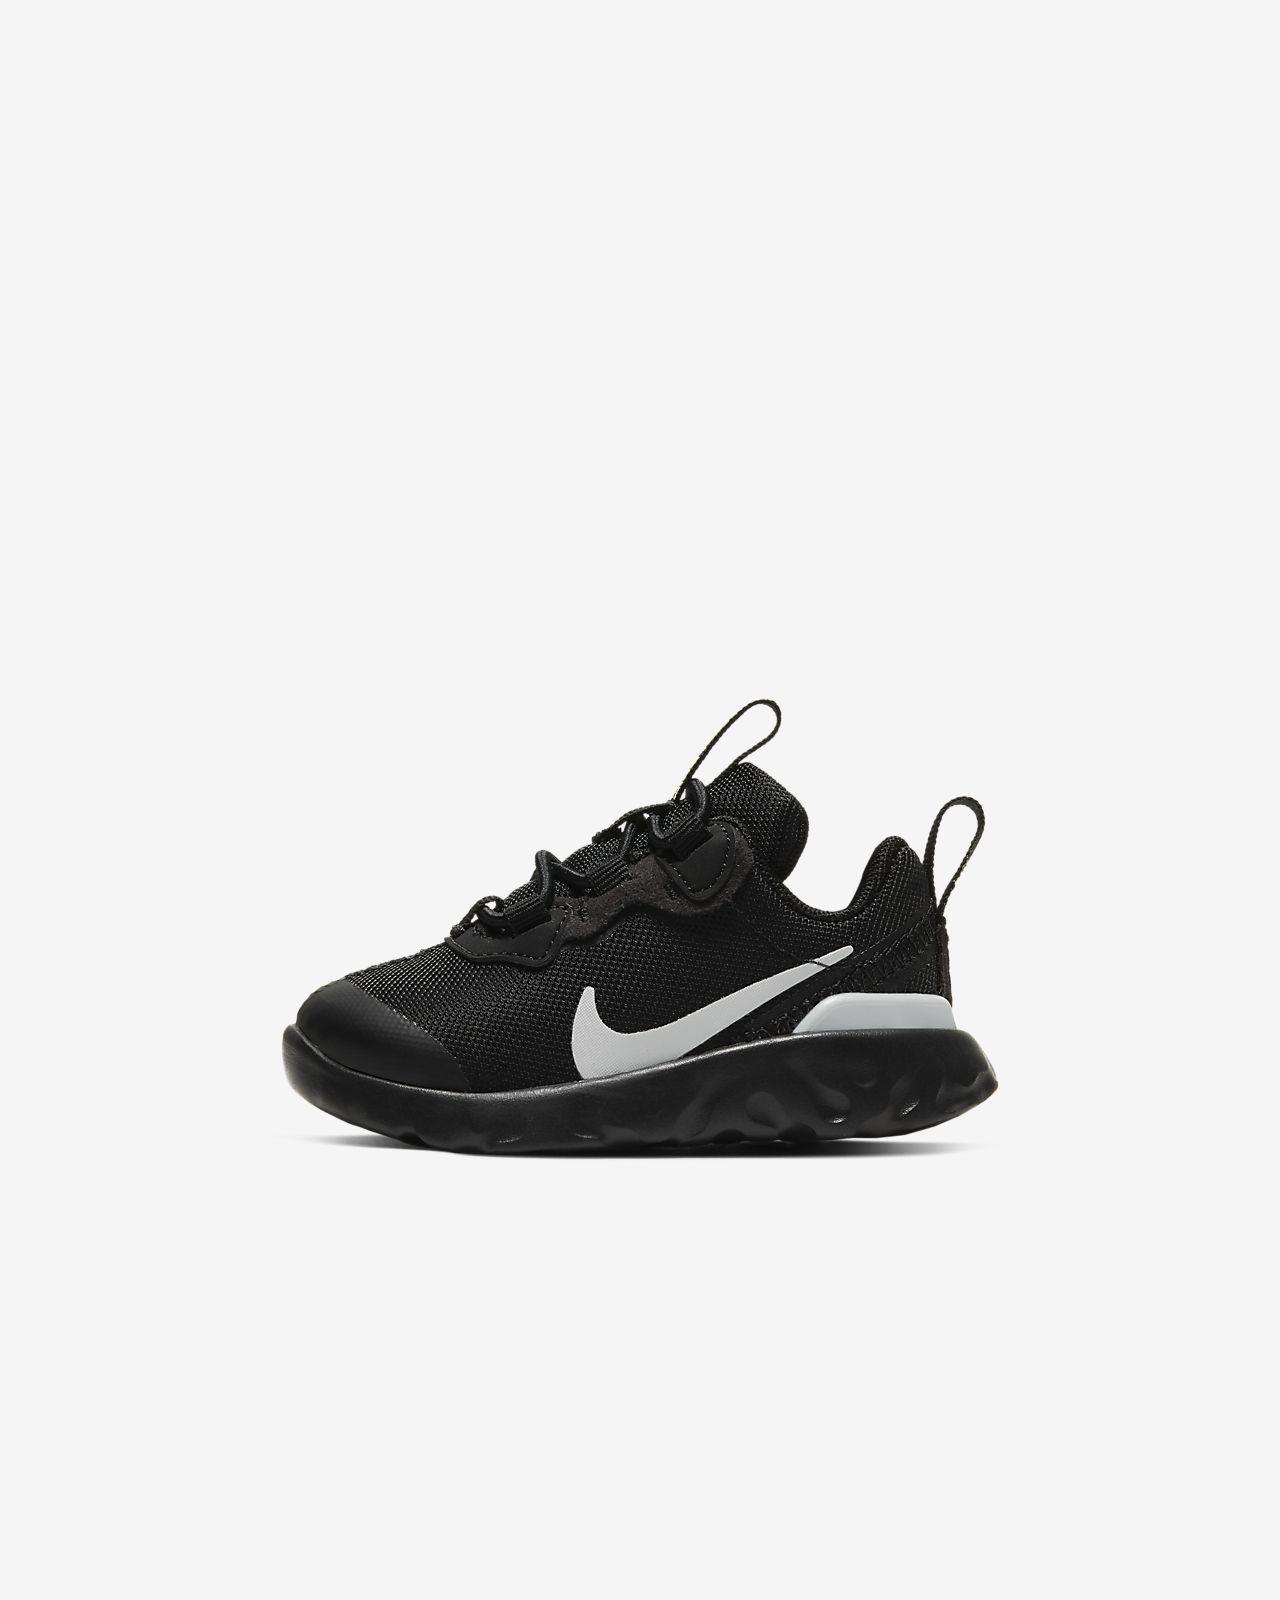 Nike Baby Shoes : Nike Clearance Sale